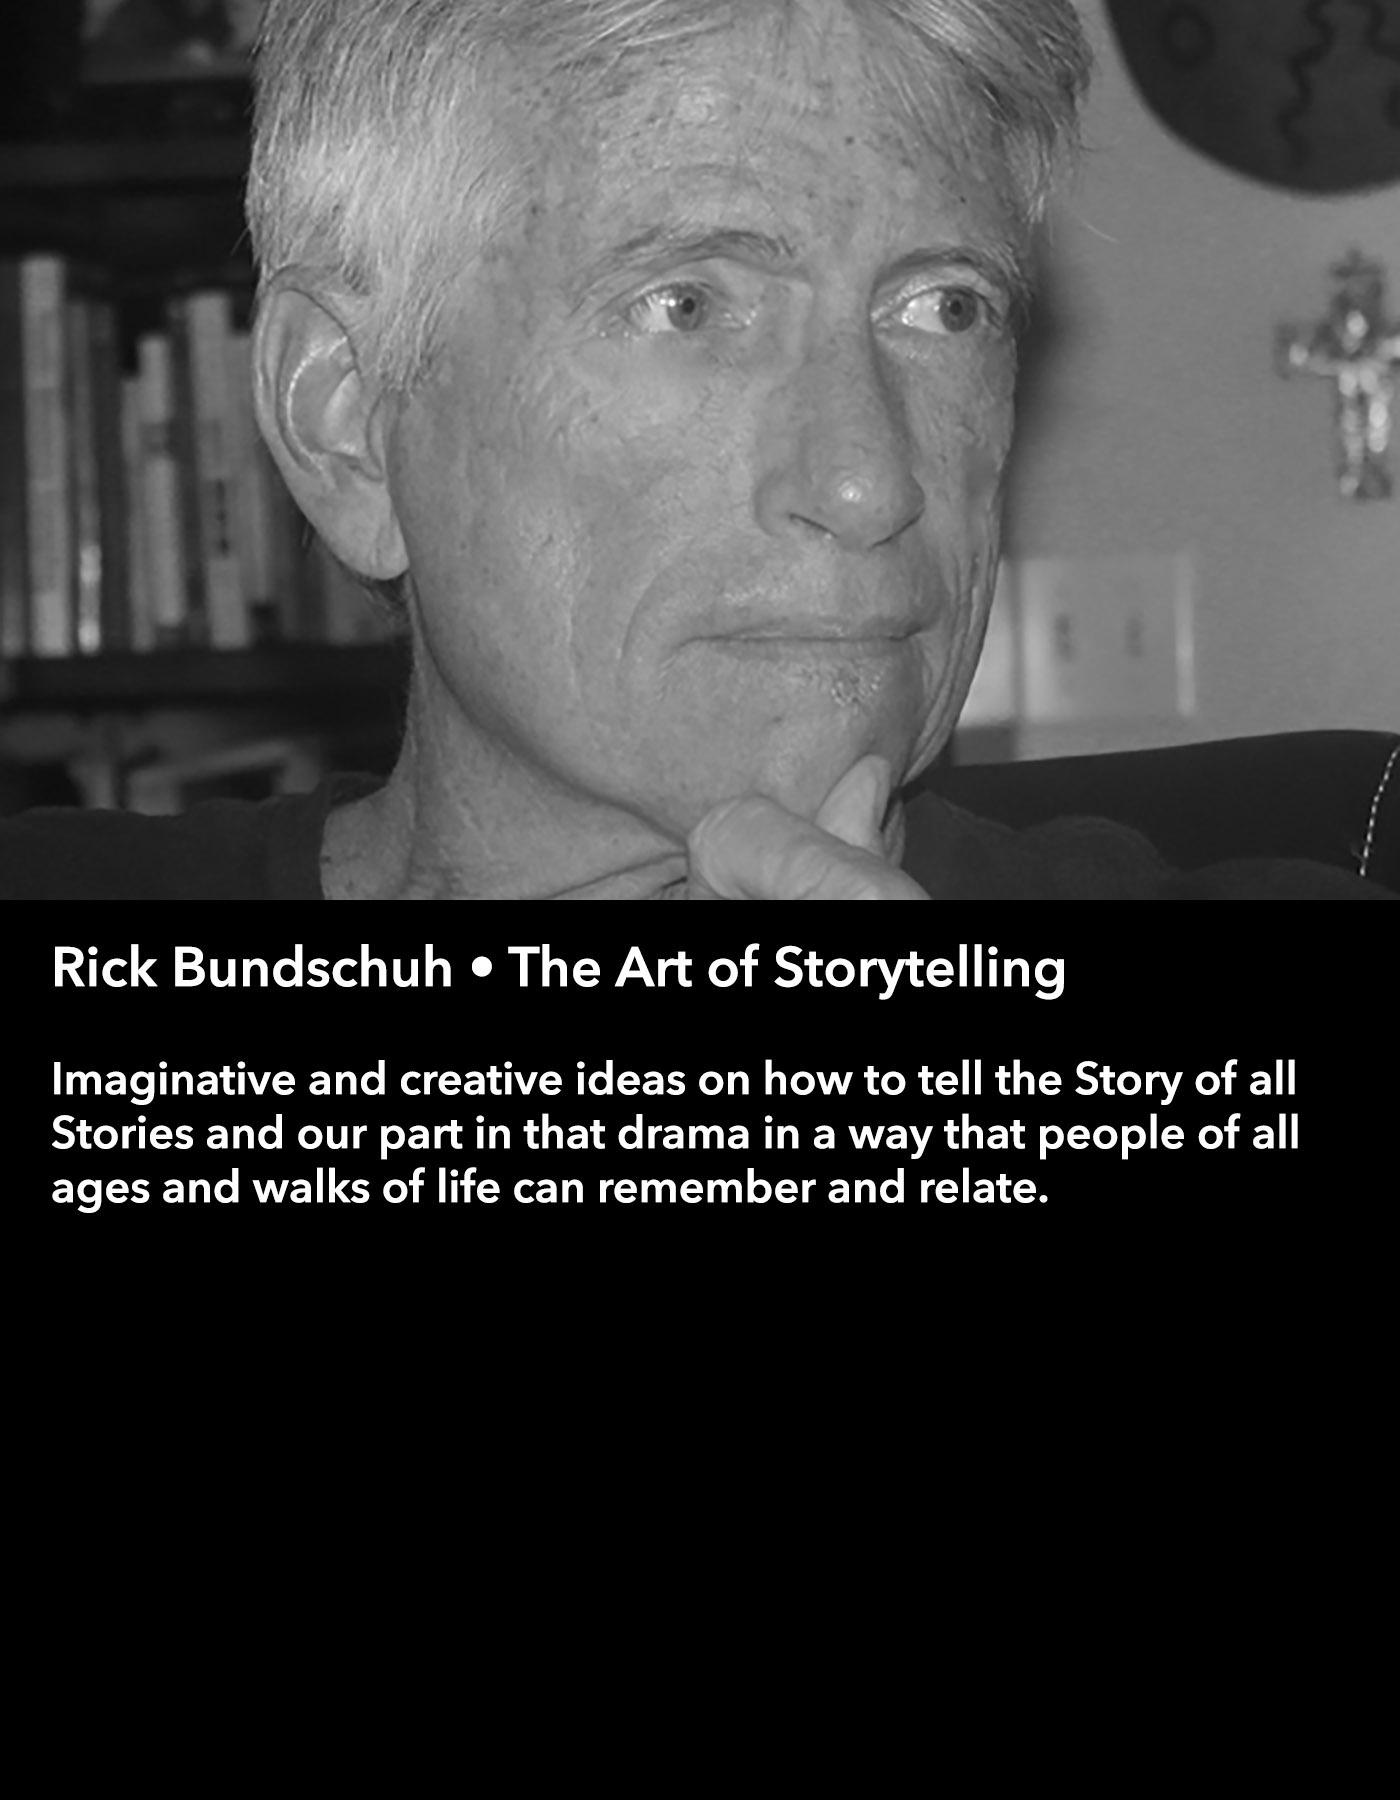 Rick Bundschuh • The Art of Storytelling • Friday Night, March 17 • 8:30 – 9:45 pm